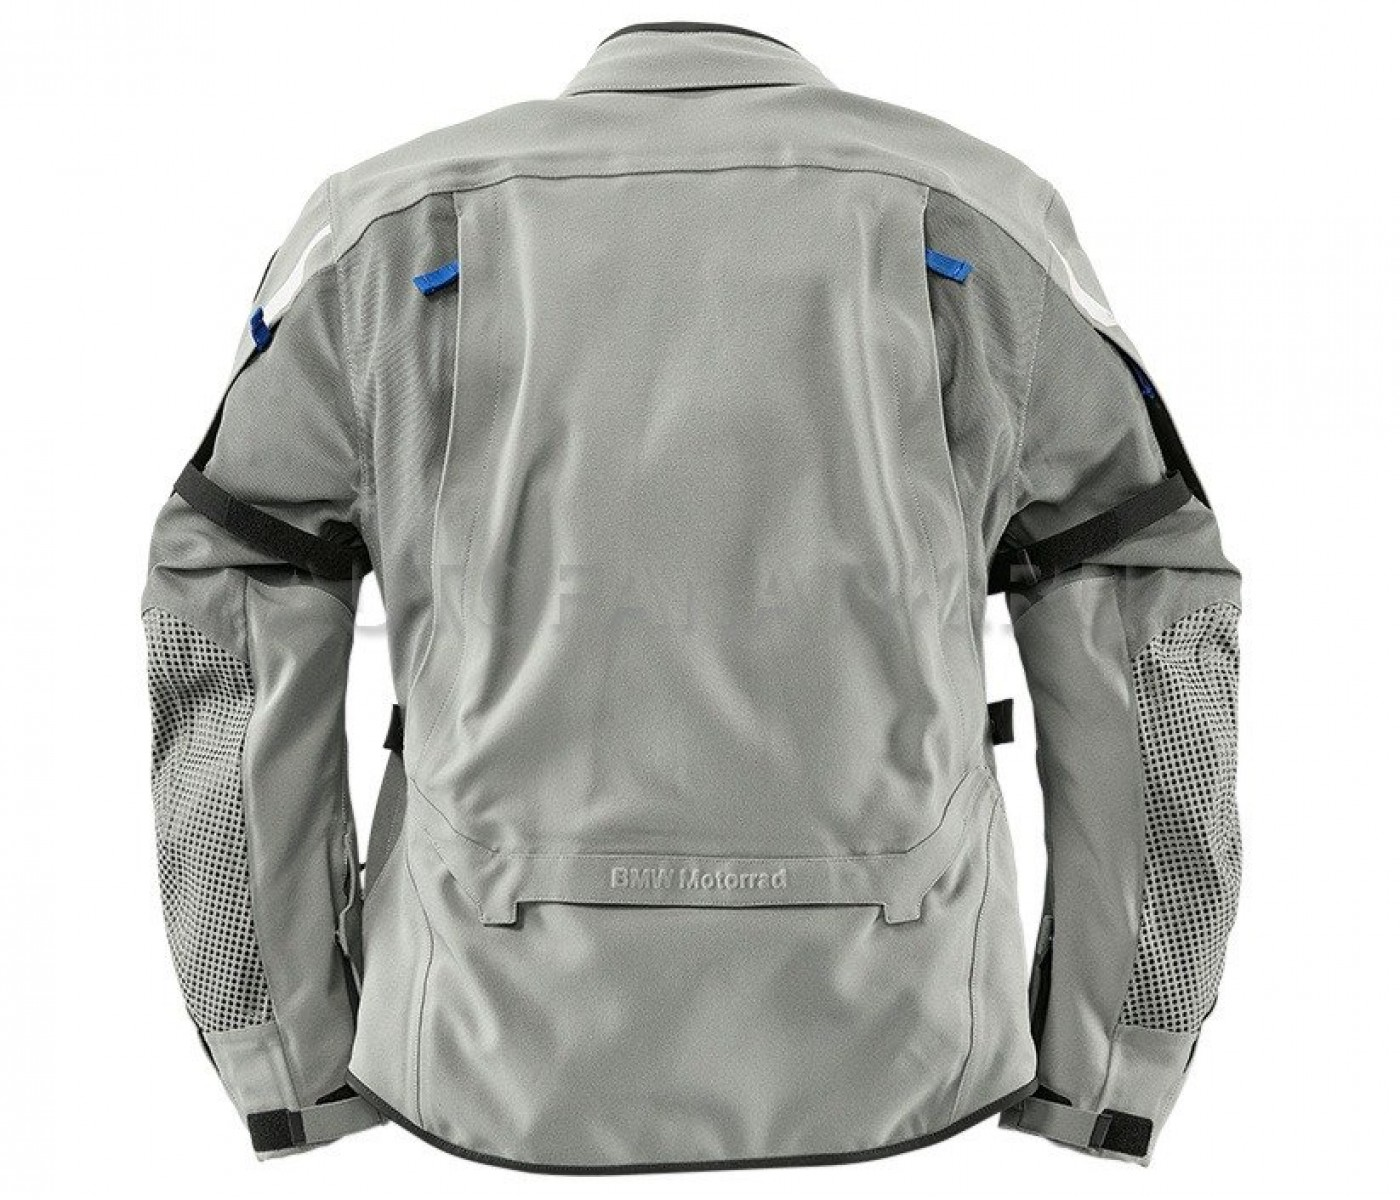 ... BMW Motorrad Μπουφάν Γυναικείο EnduroGuard Jacket Women Grey ΕΝΔΥΣΗ ... f57fc7745e1